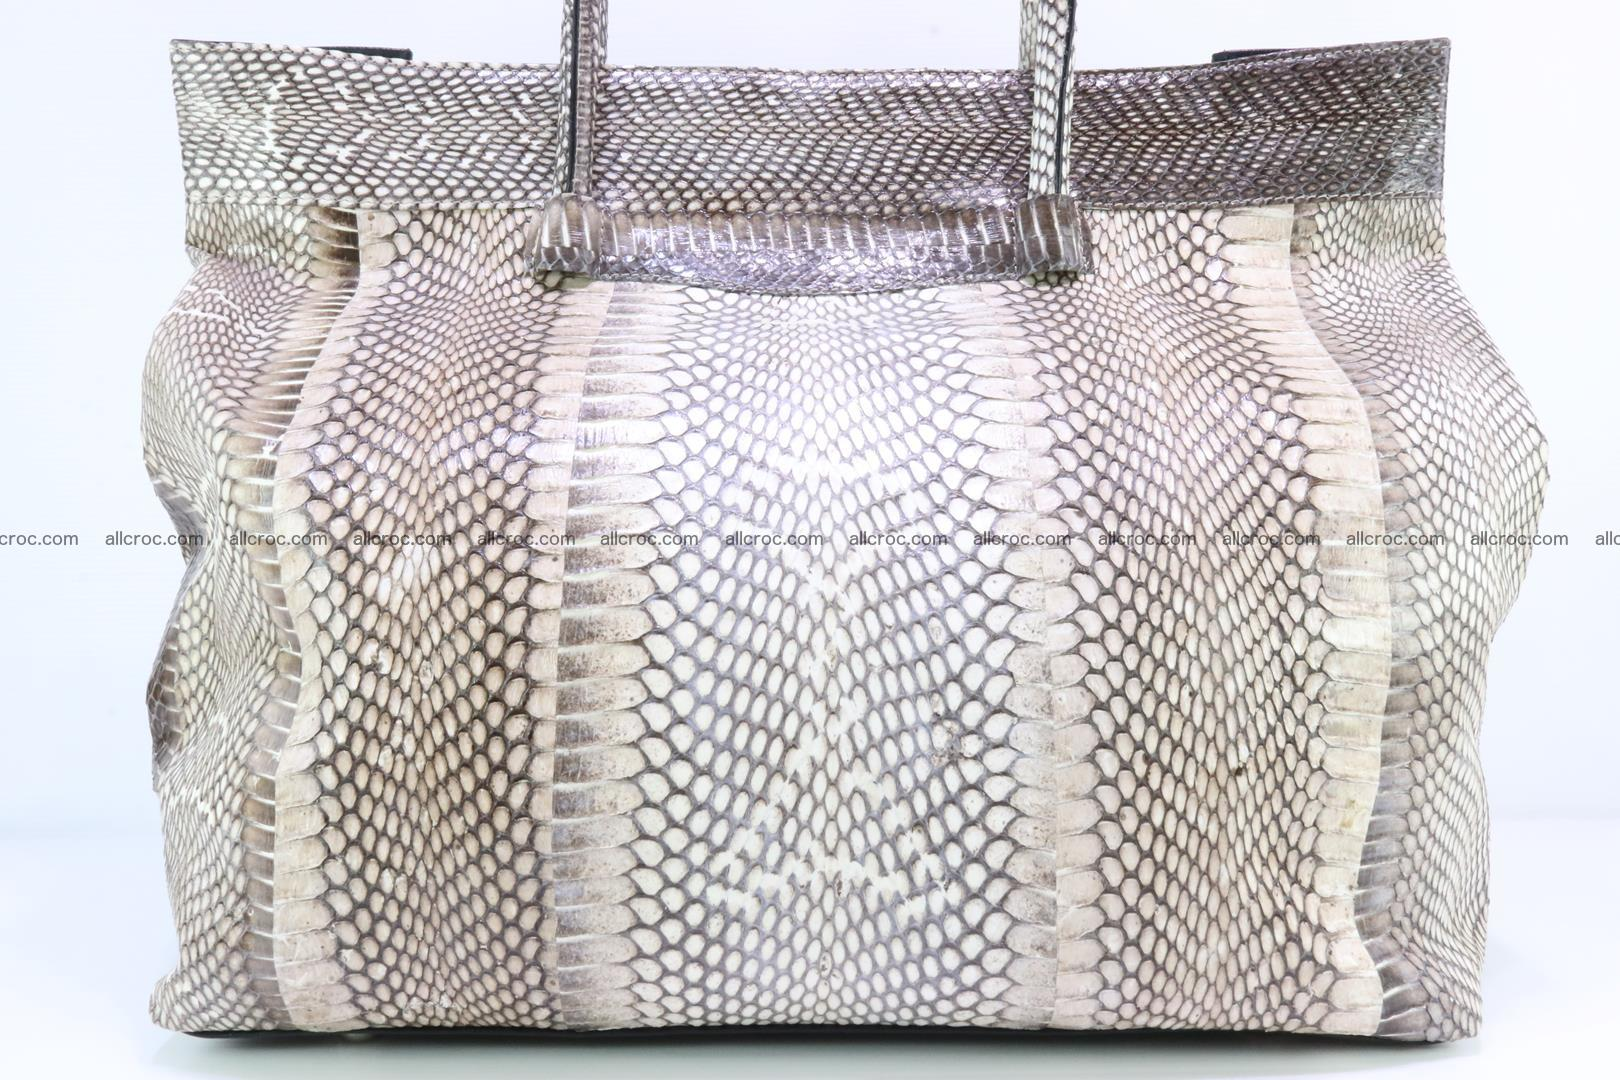 Handbag from cobra skin for lady 183 Foto 11